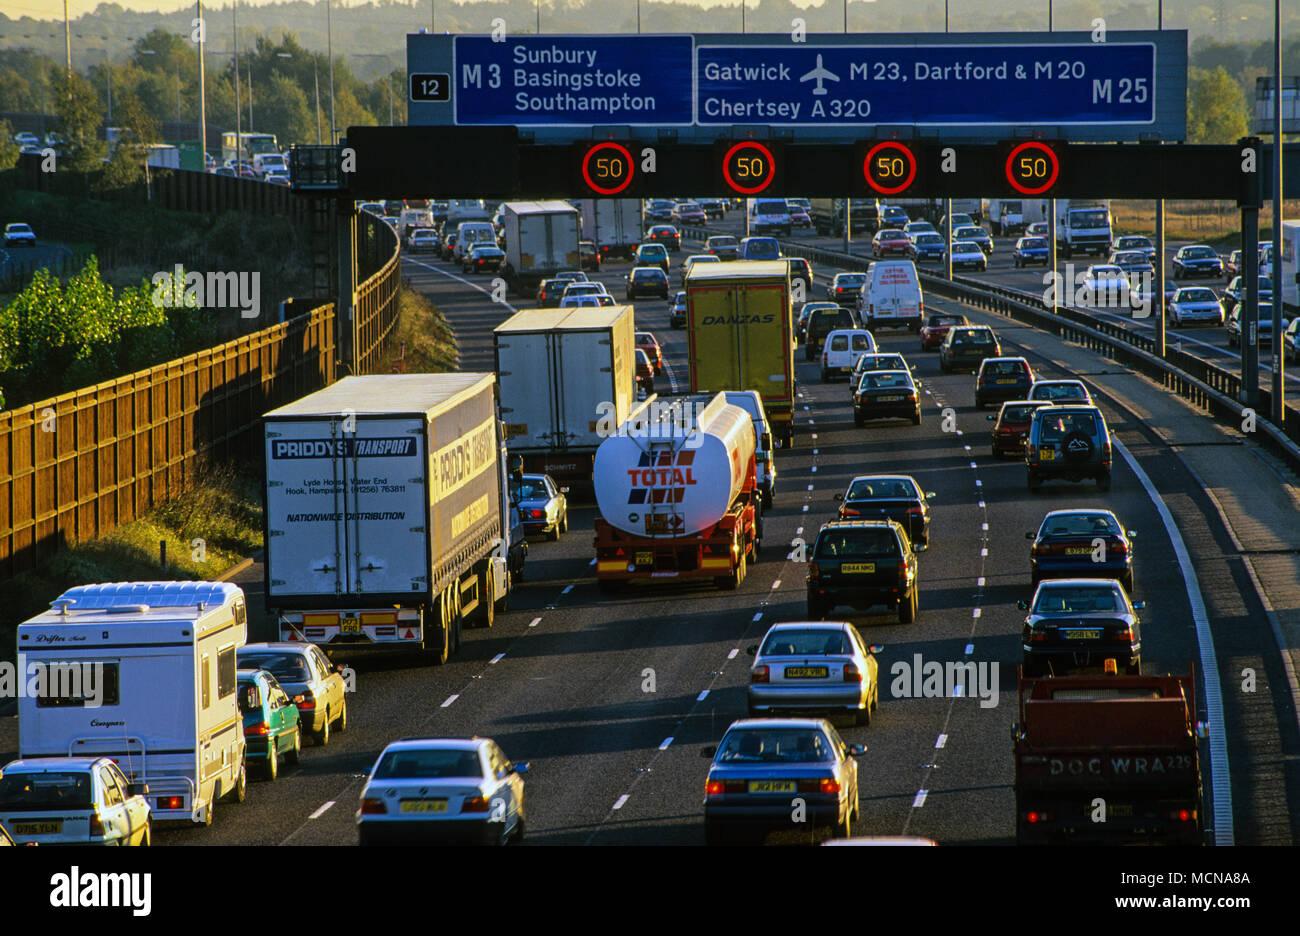 Traffic Jam M25 Motorway, Nr Junction 12, London, England, UK, GB. - Stock Image